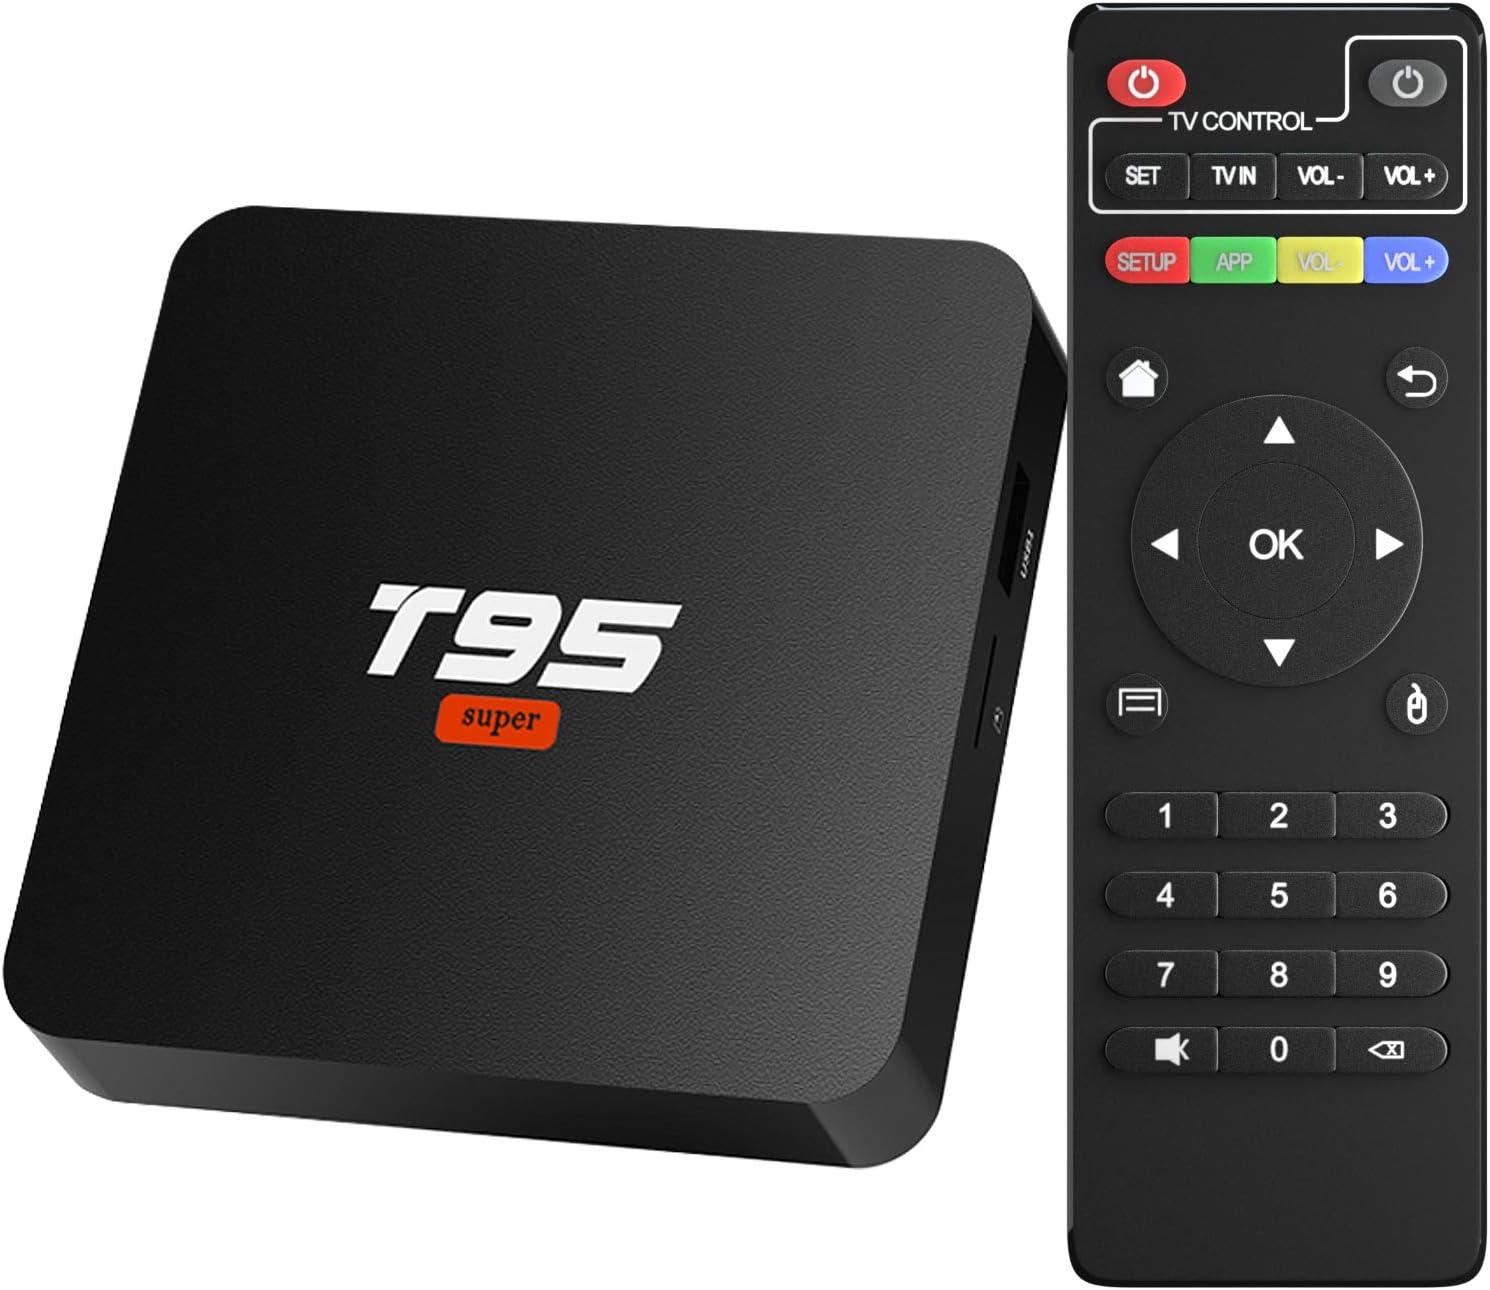 Android 10.0 TV Box, Sidiwen T95 Super Android Box Allwinner H3 Quad-Core 2GB RAM 16GB ROM Media Player, 2.4Ghz WiFi Ethernet 3D 4K Smart TV Box: Amazon.es: Electrónica